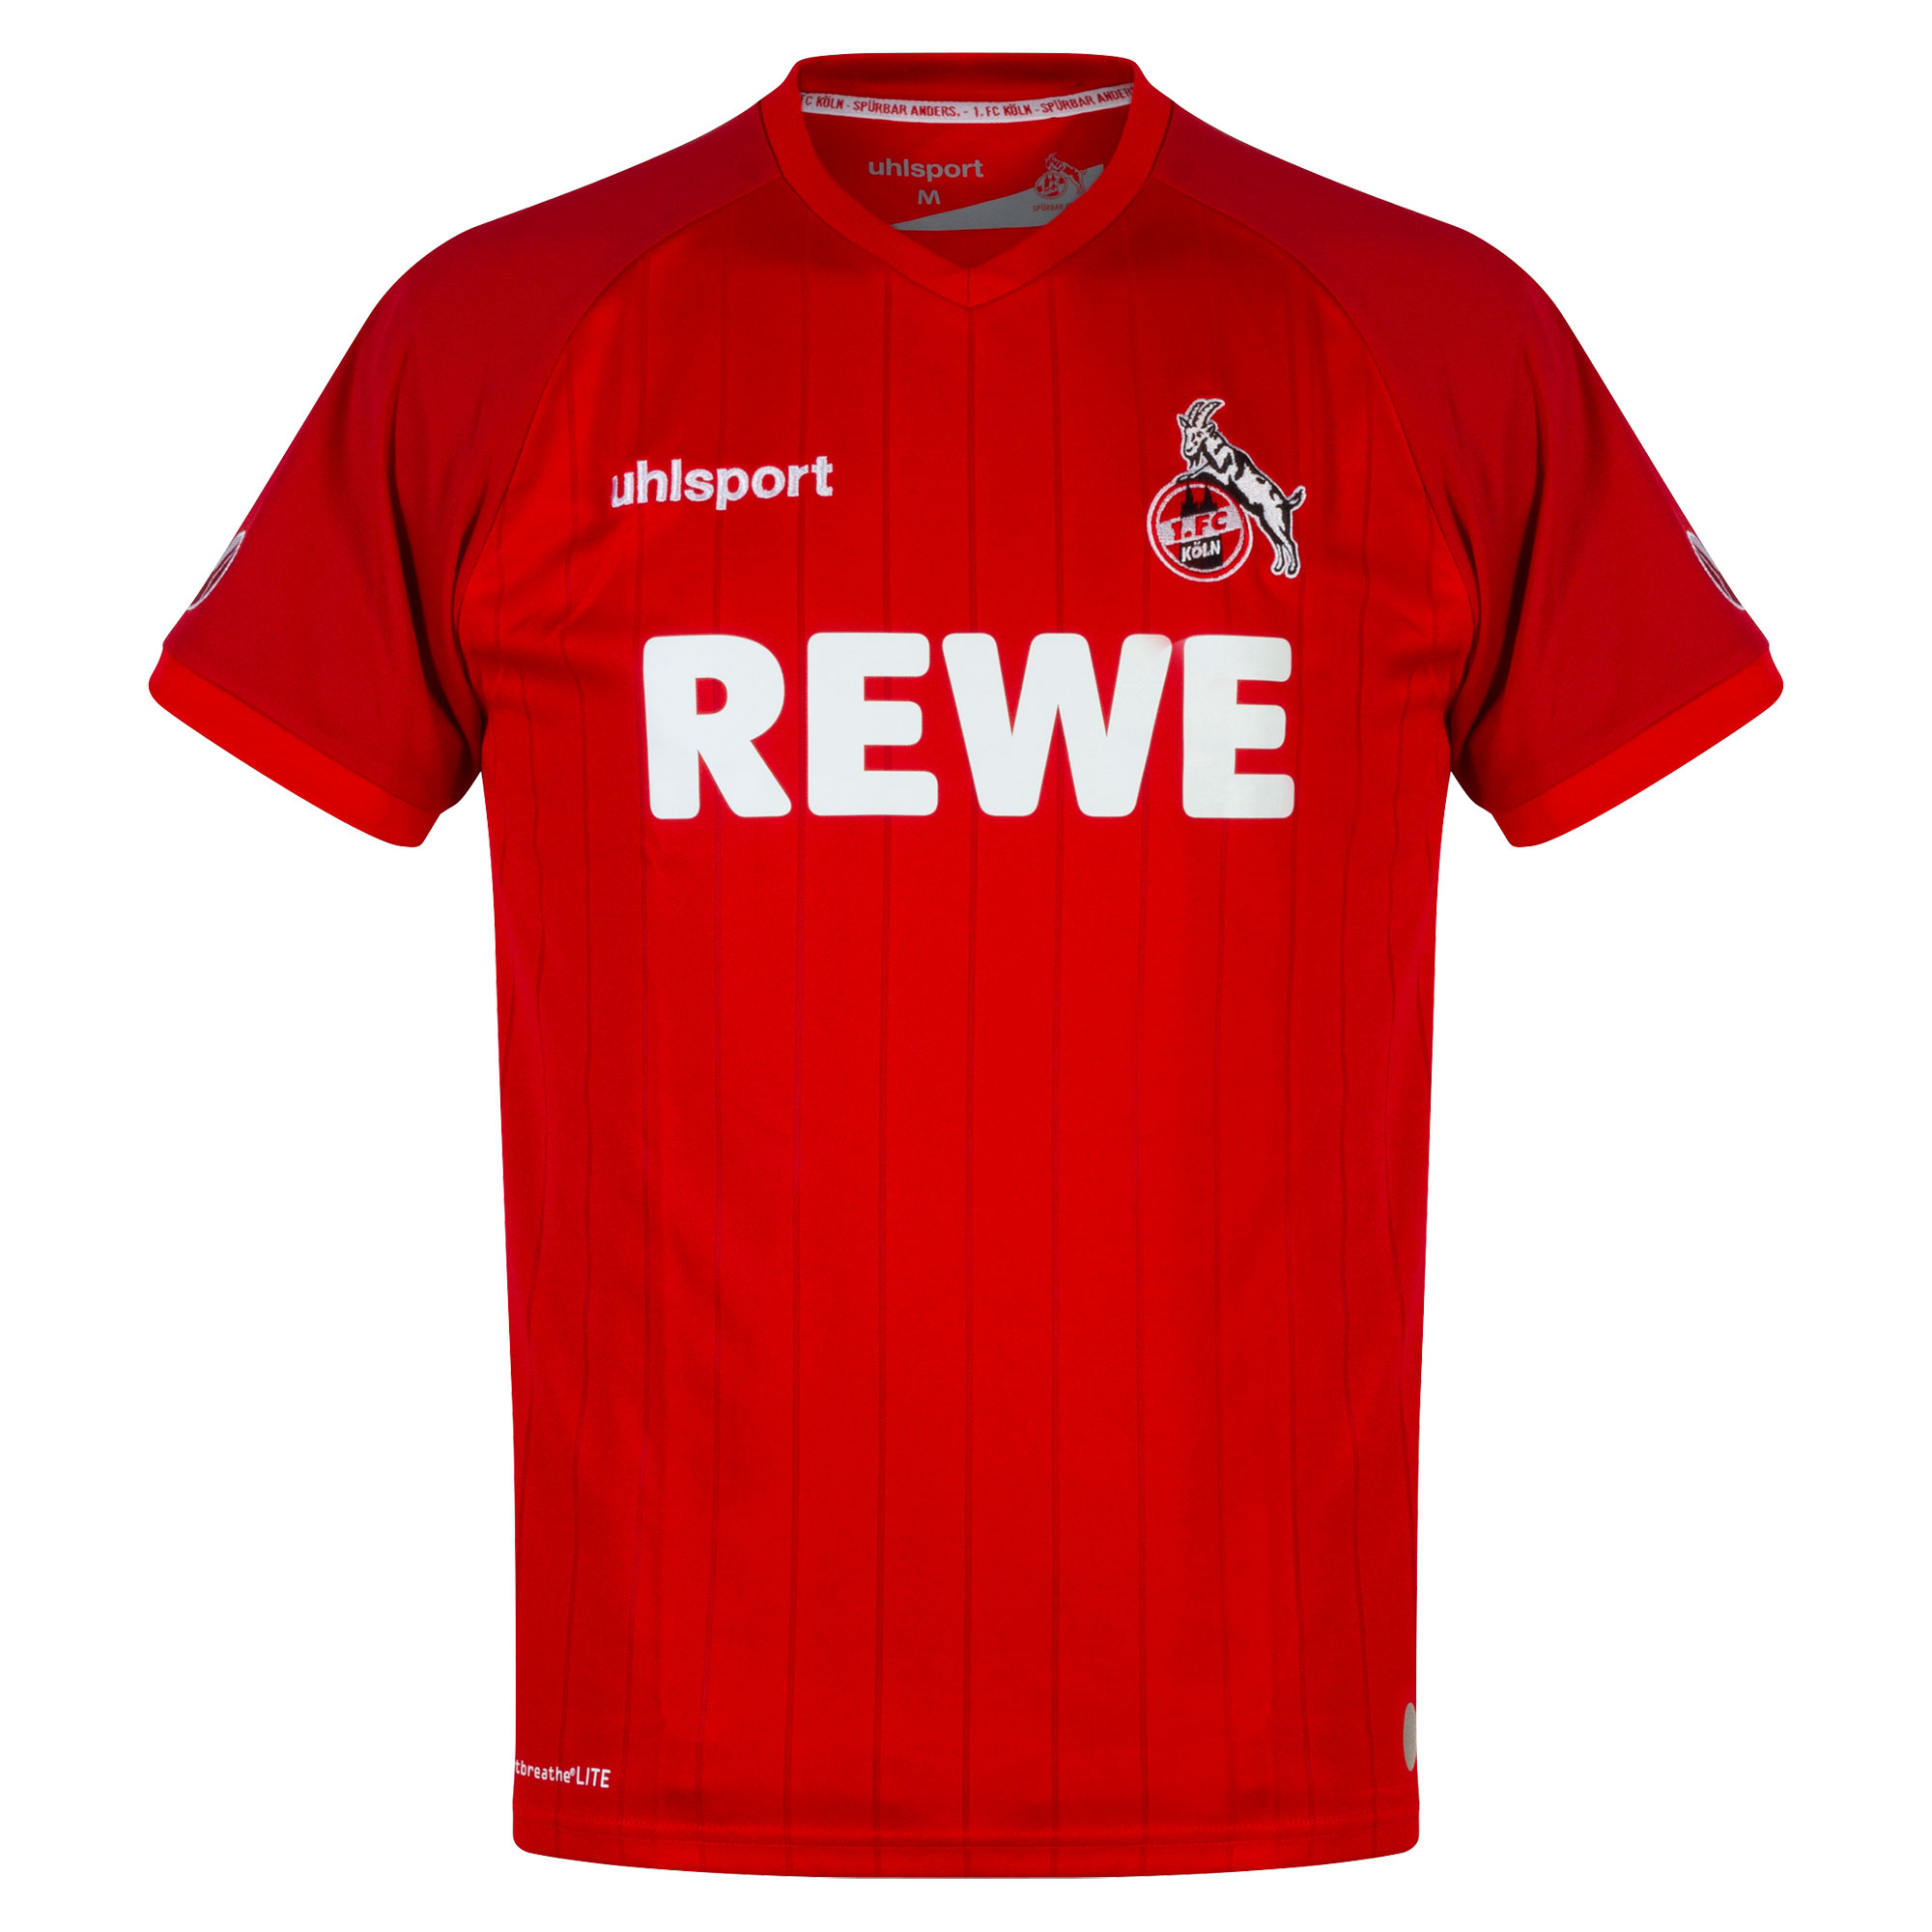 Uhlsport 1.FC Koln Away Shirt 2019-2020